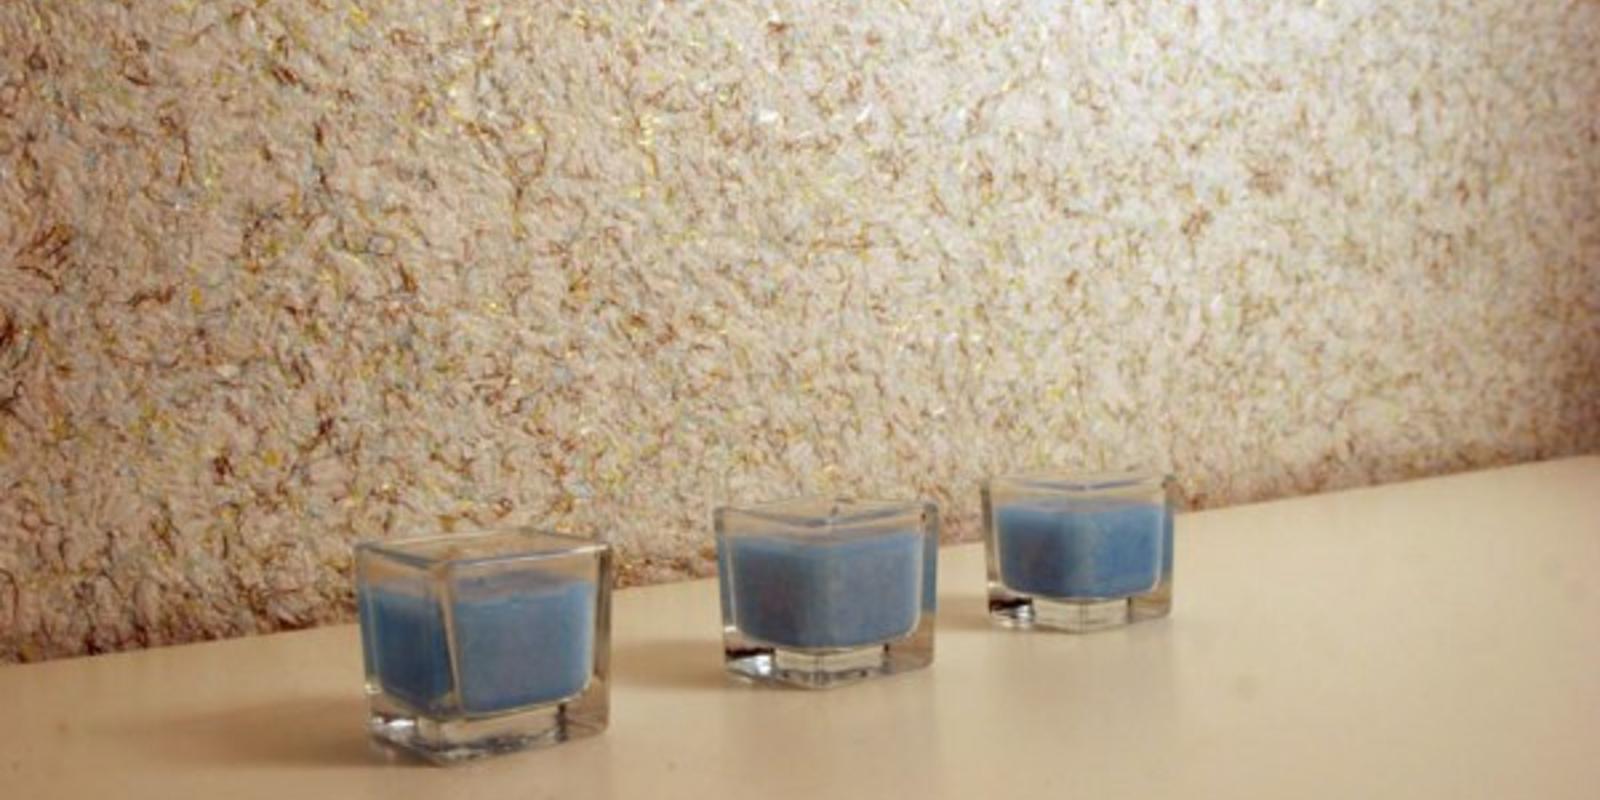 Wat kost japans sierpleister katoenpleister prijzen slimster for Wat kost stucen per m2